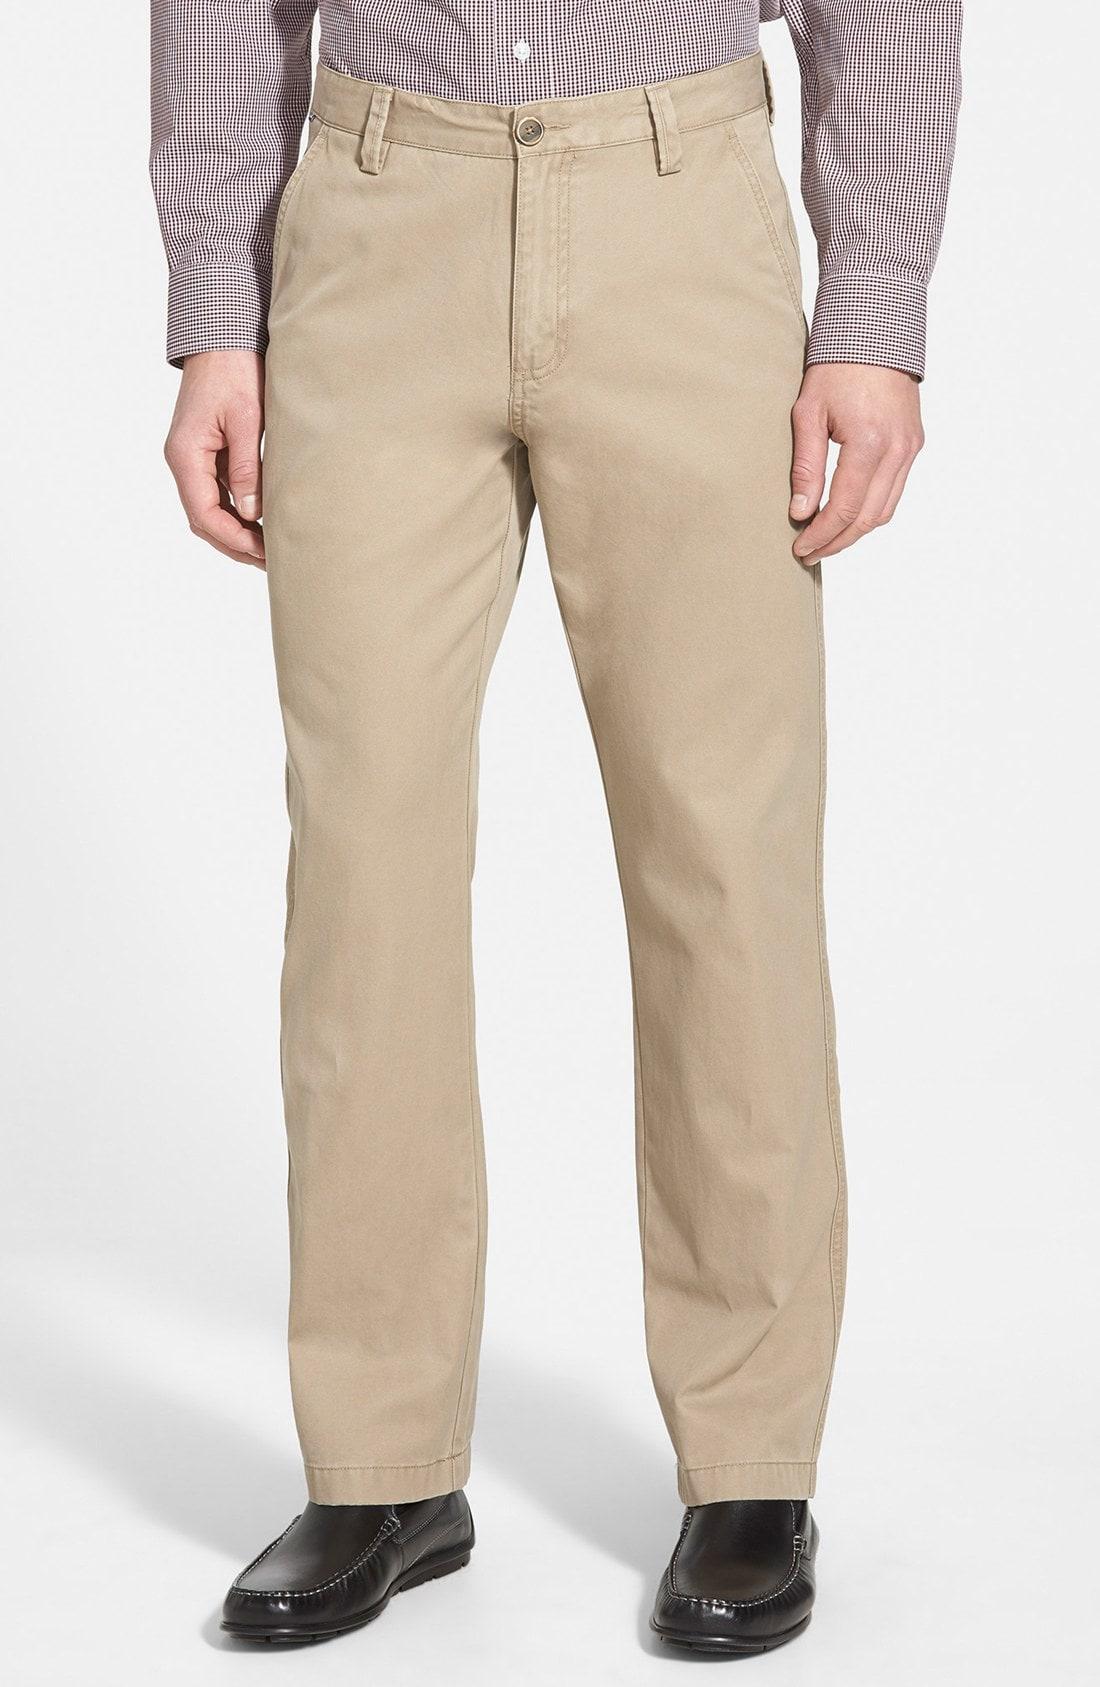 Cutter & Buck 'Beckett' Straight Leg Washed Cotton Pants (Online Only)